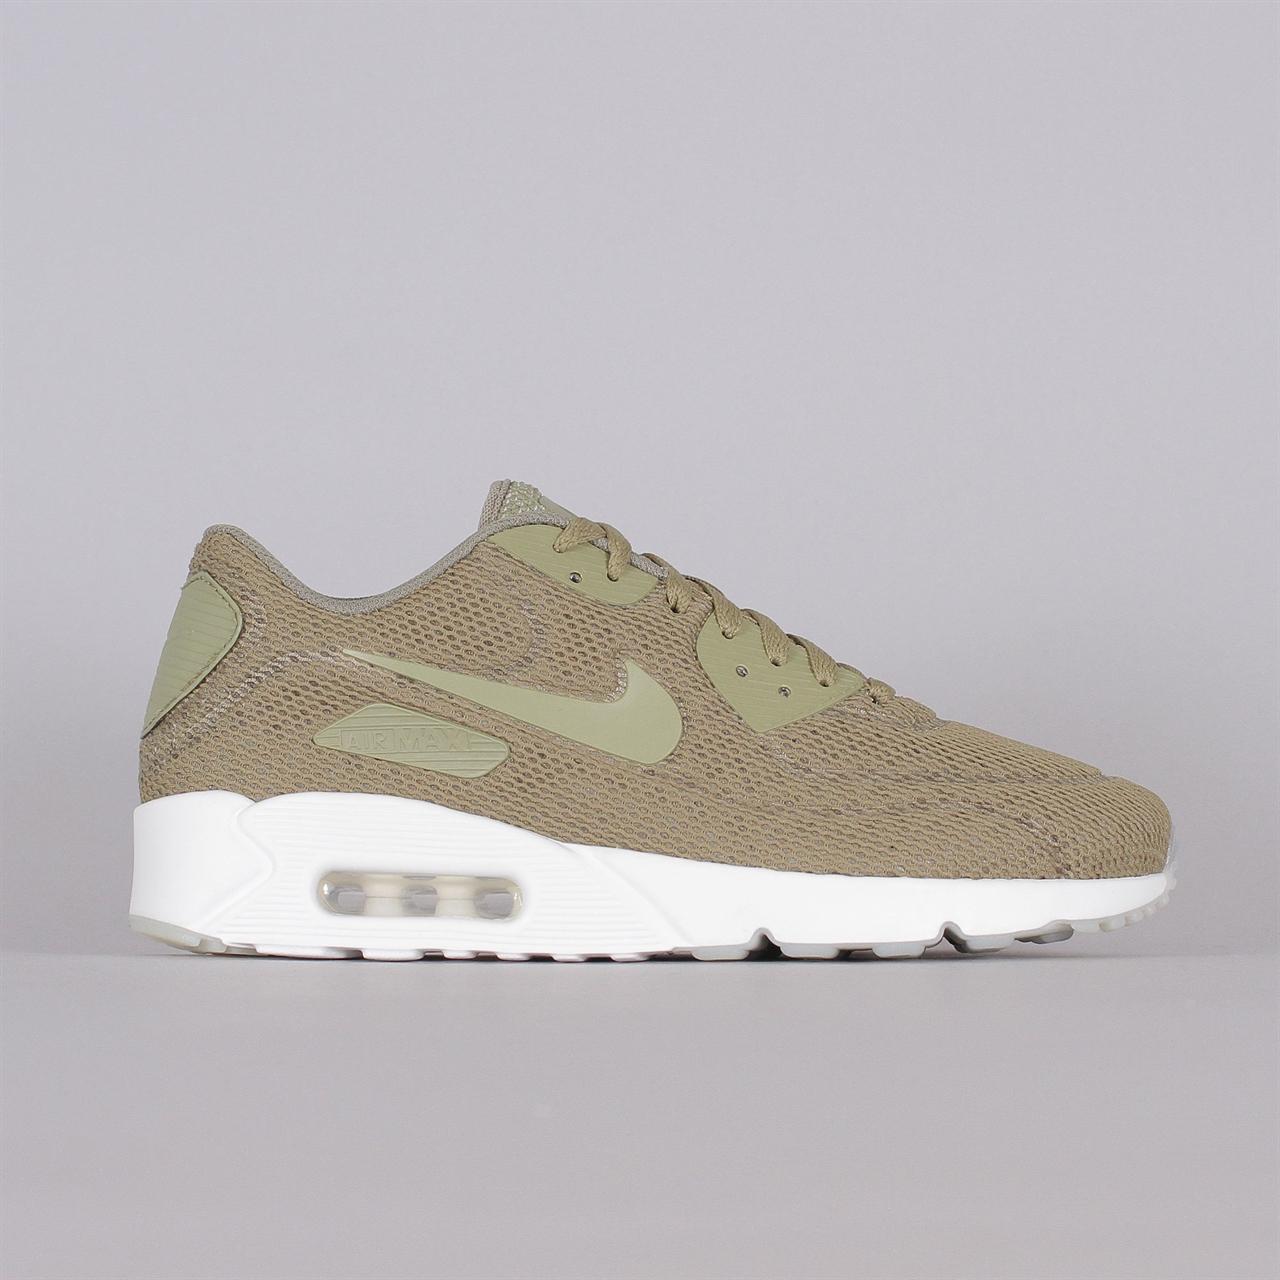 sale retailer fa53e f7173 nike sportswear air max 90 ultra 2.0 br 898010 200